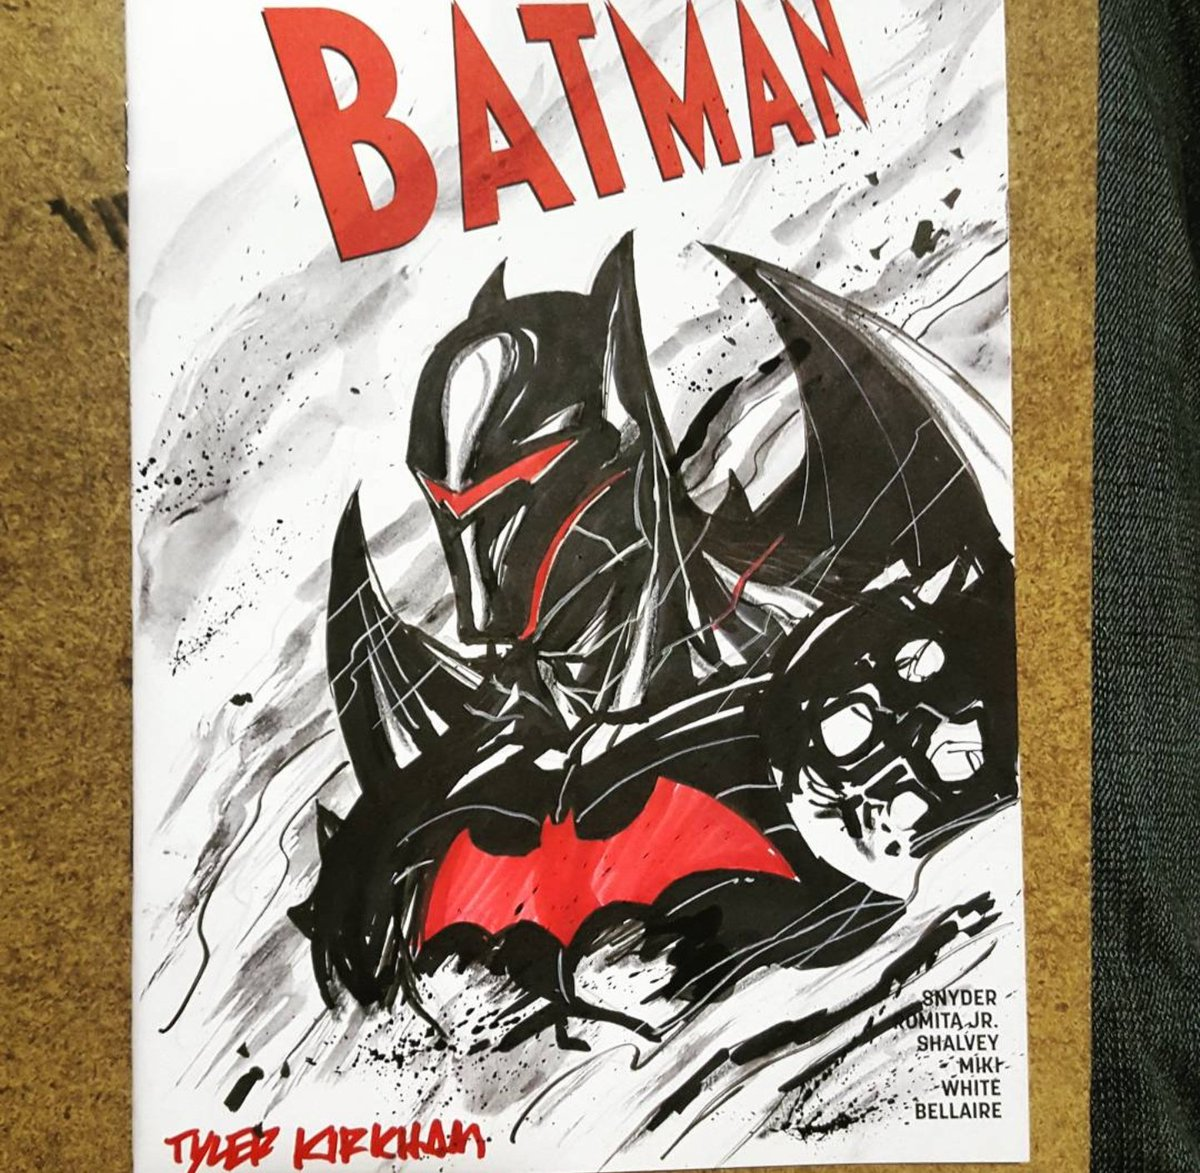 tyler kirkham on twitter hellbat batman sketch from longbeachcomiccon drawing sketches art comicartist tylerkirkham drawings dccomics